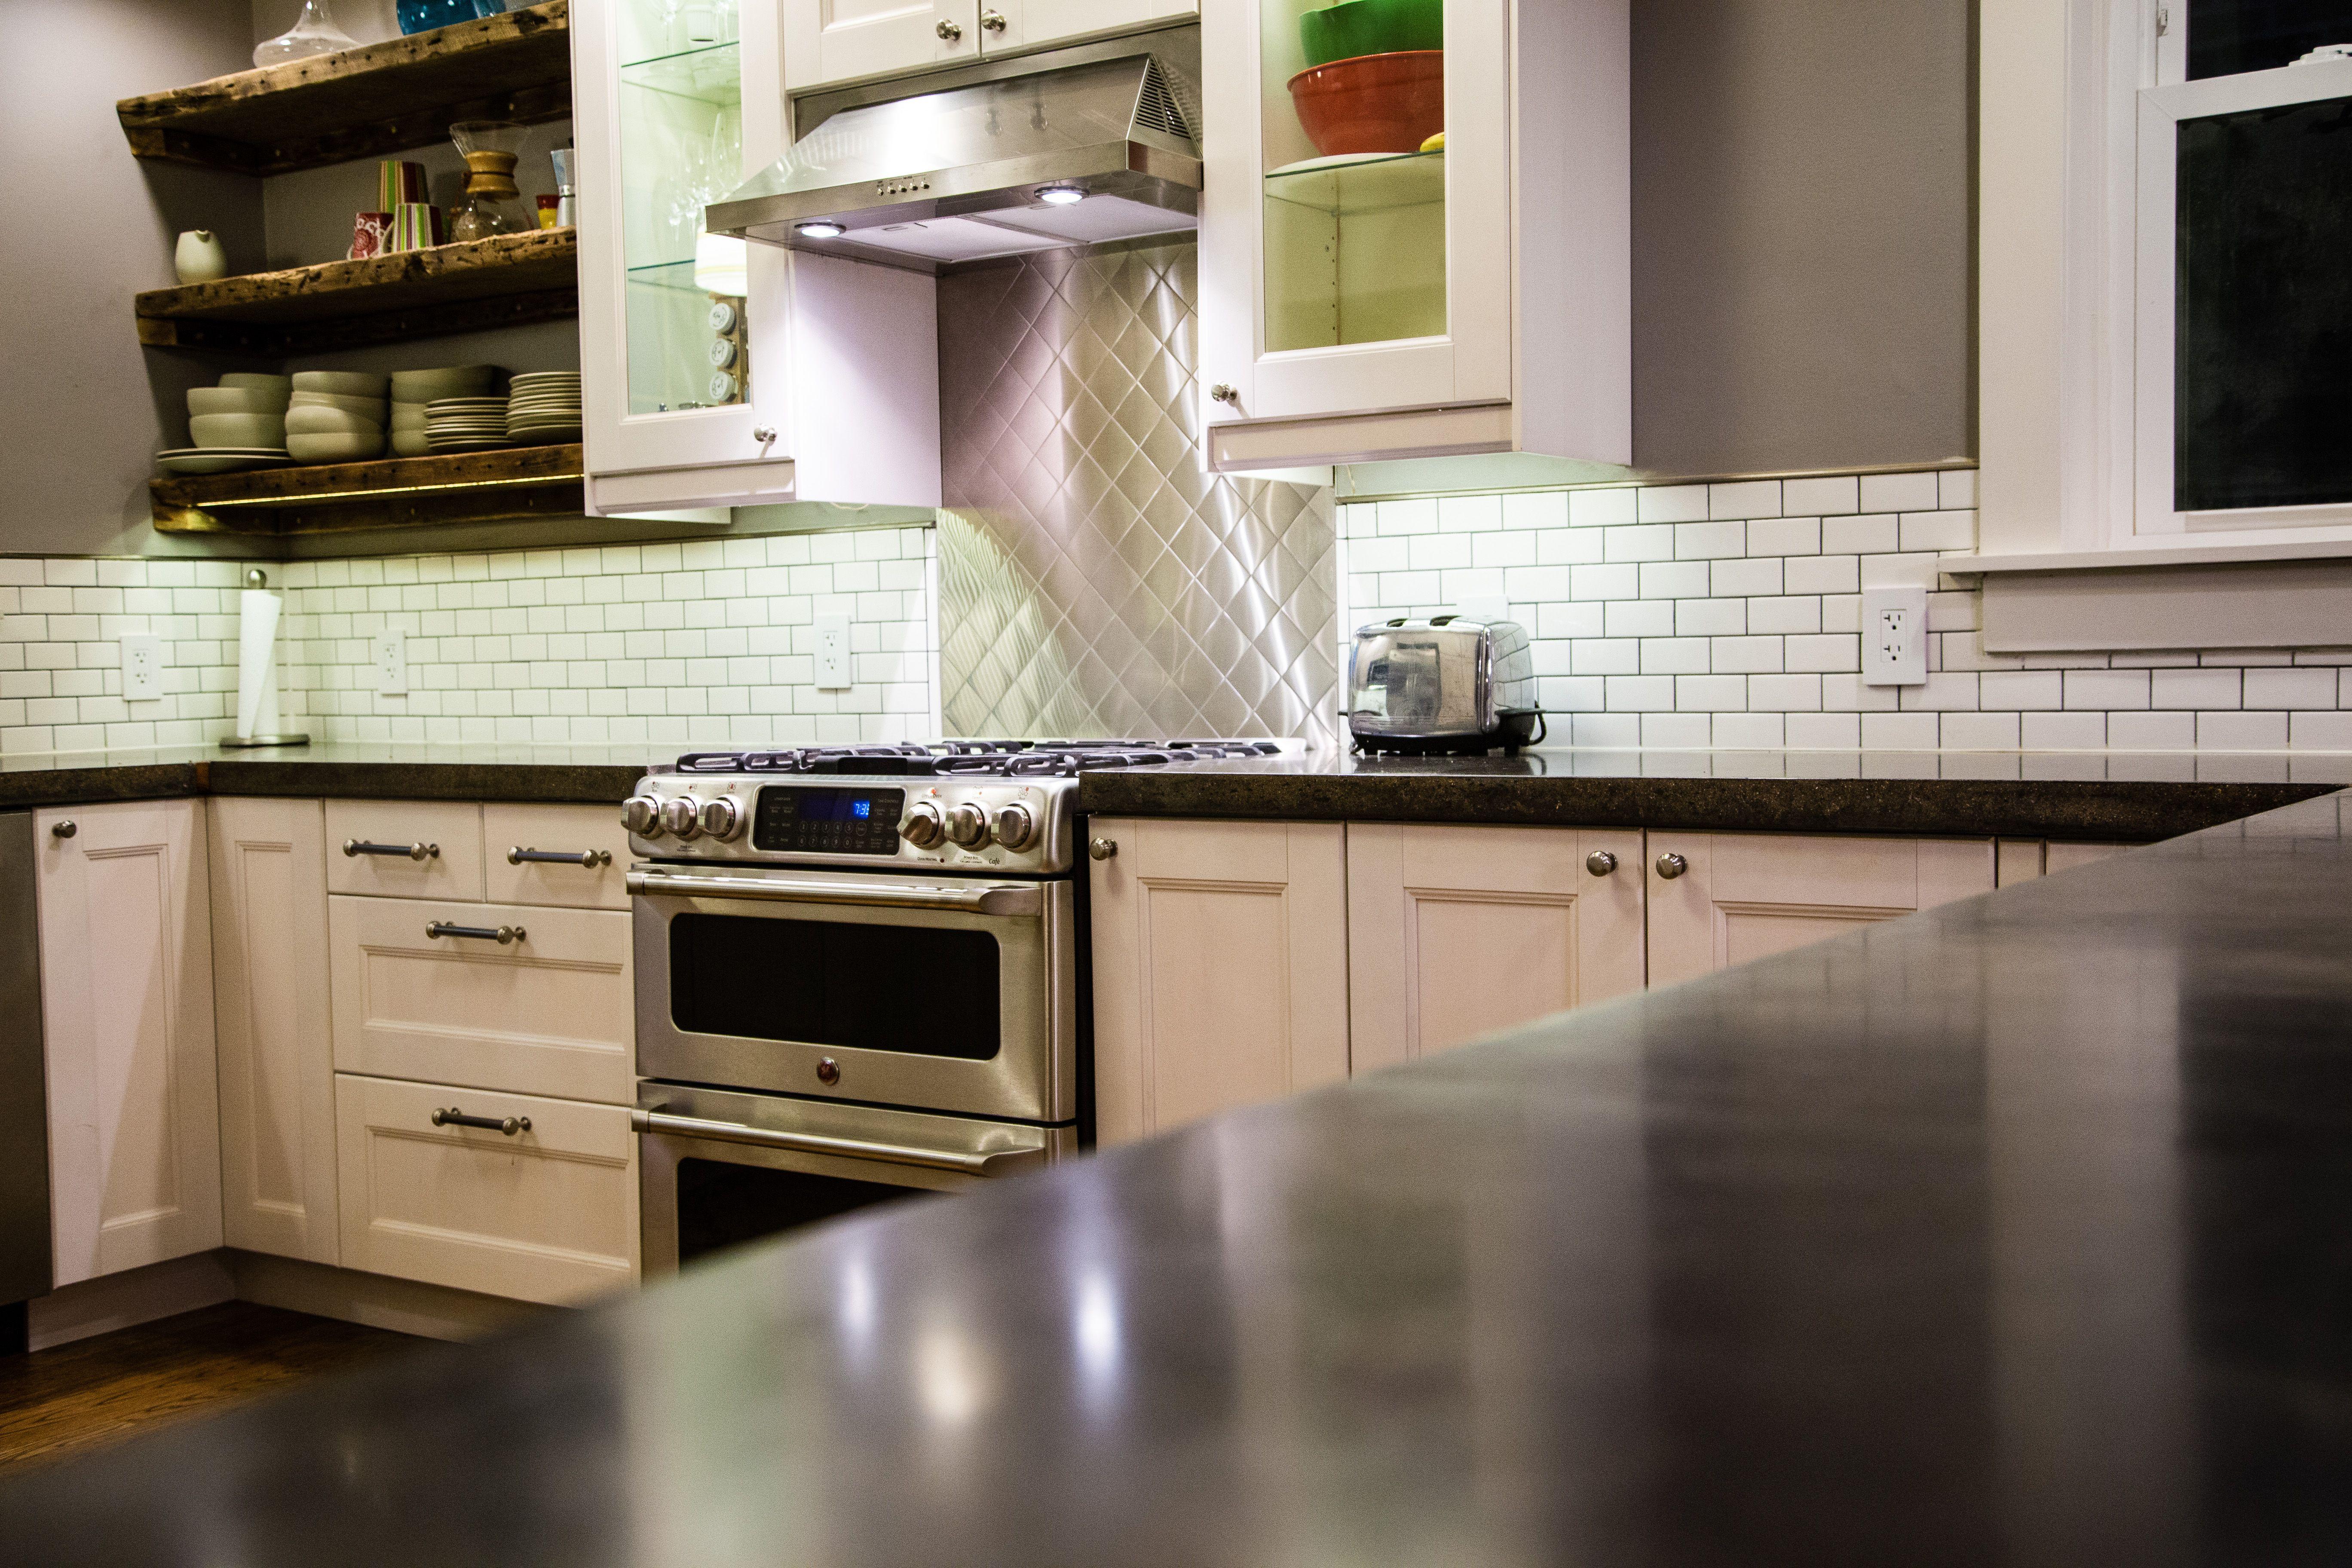 Kitchen rehab diyhomemade concrete counters subway tile kitchen rehab diyhomemade concrete counters subway tile backsplash reclaimed wood shelves dailygadgetfo Images